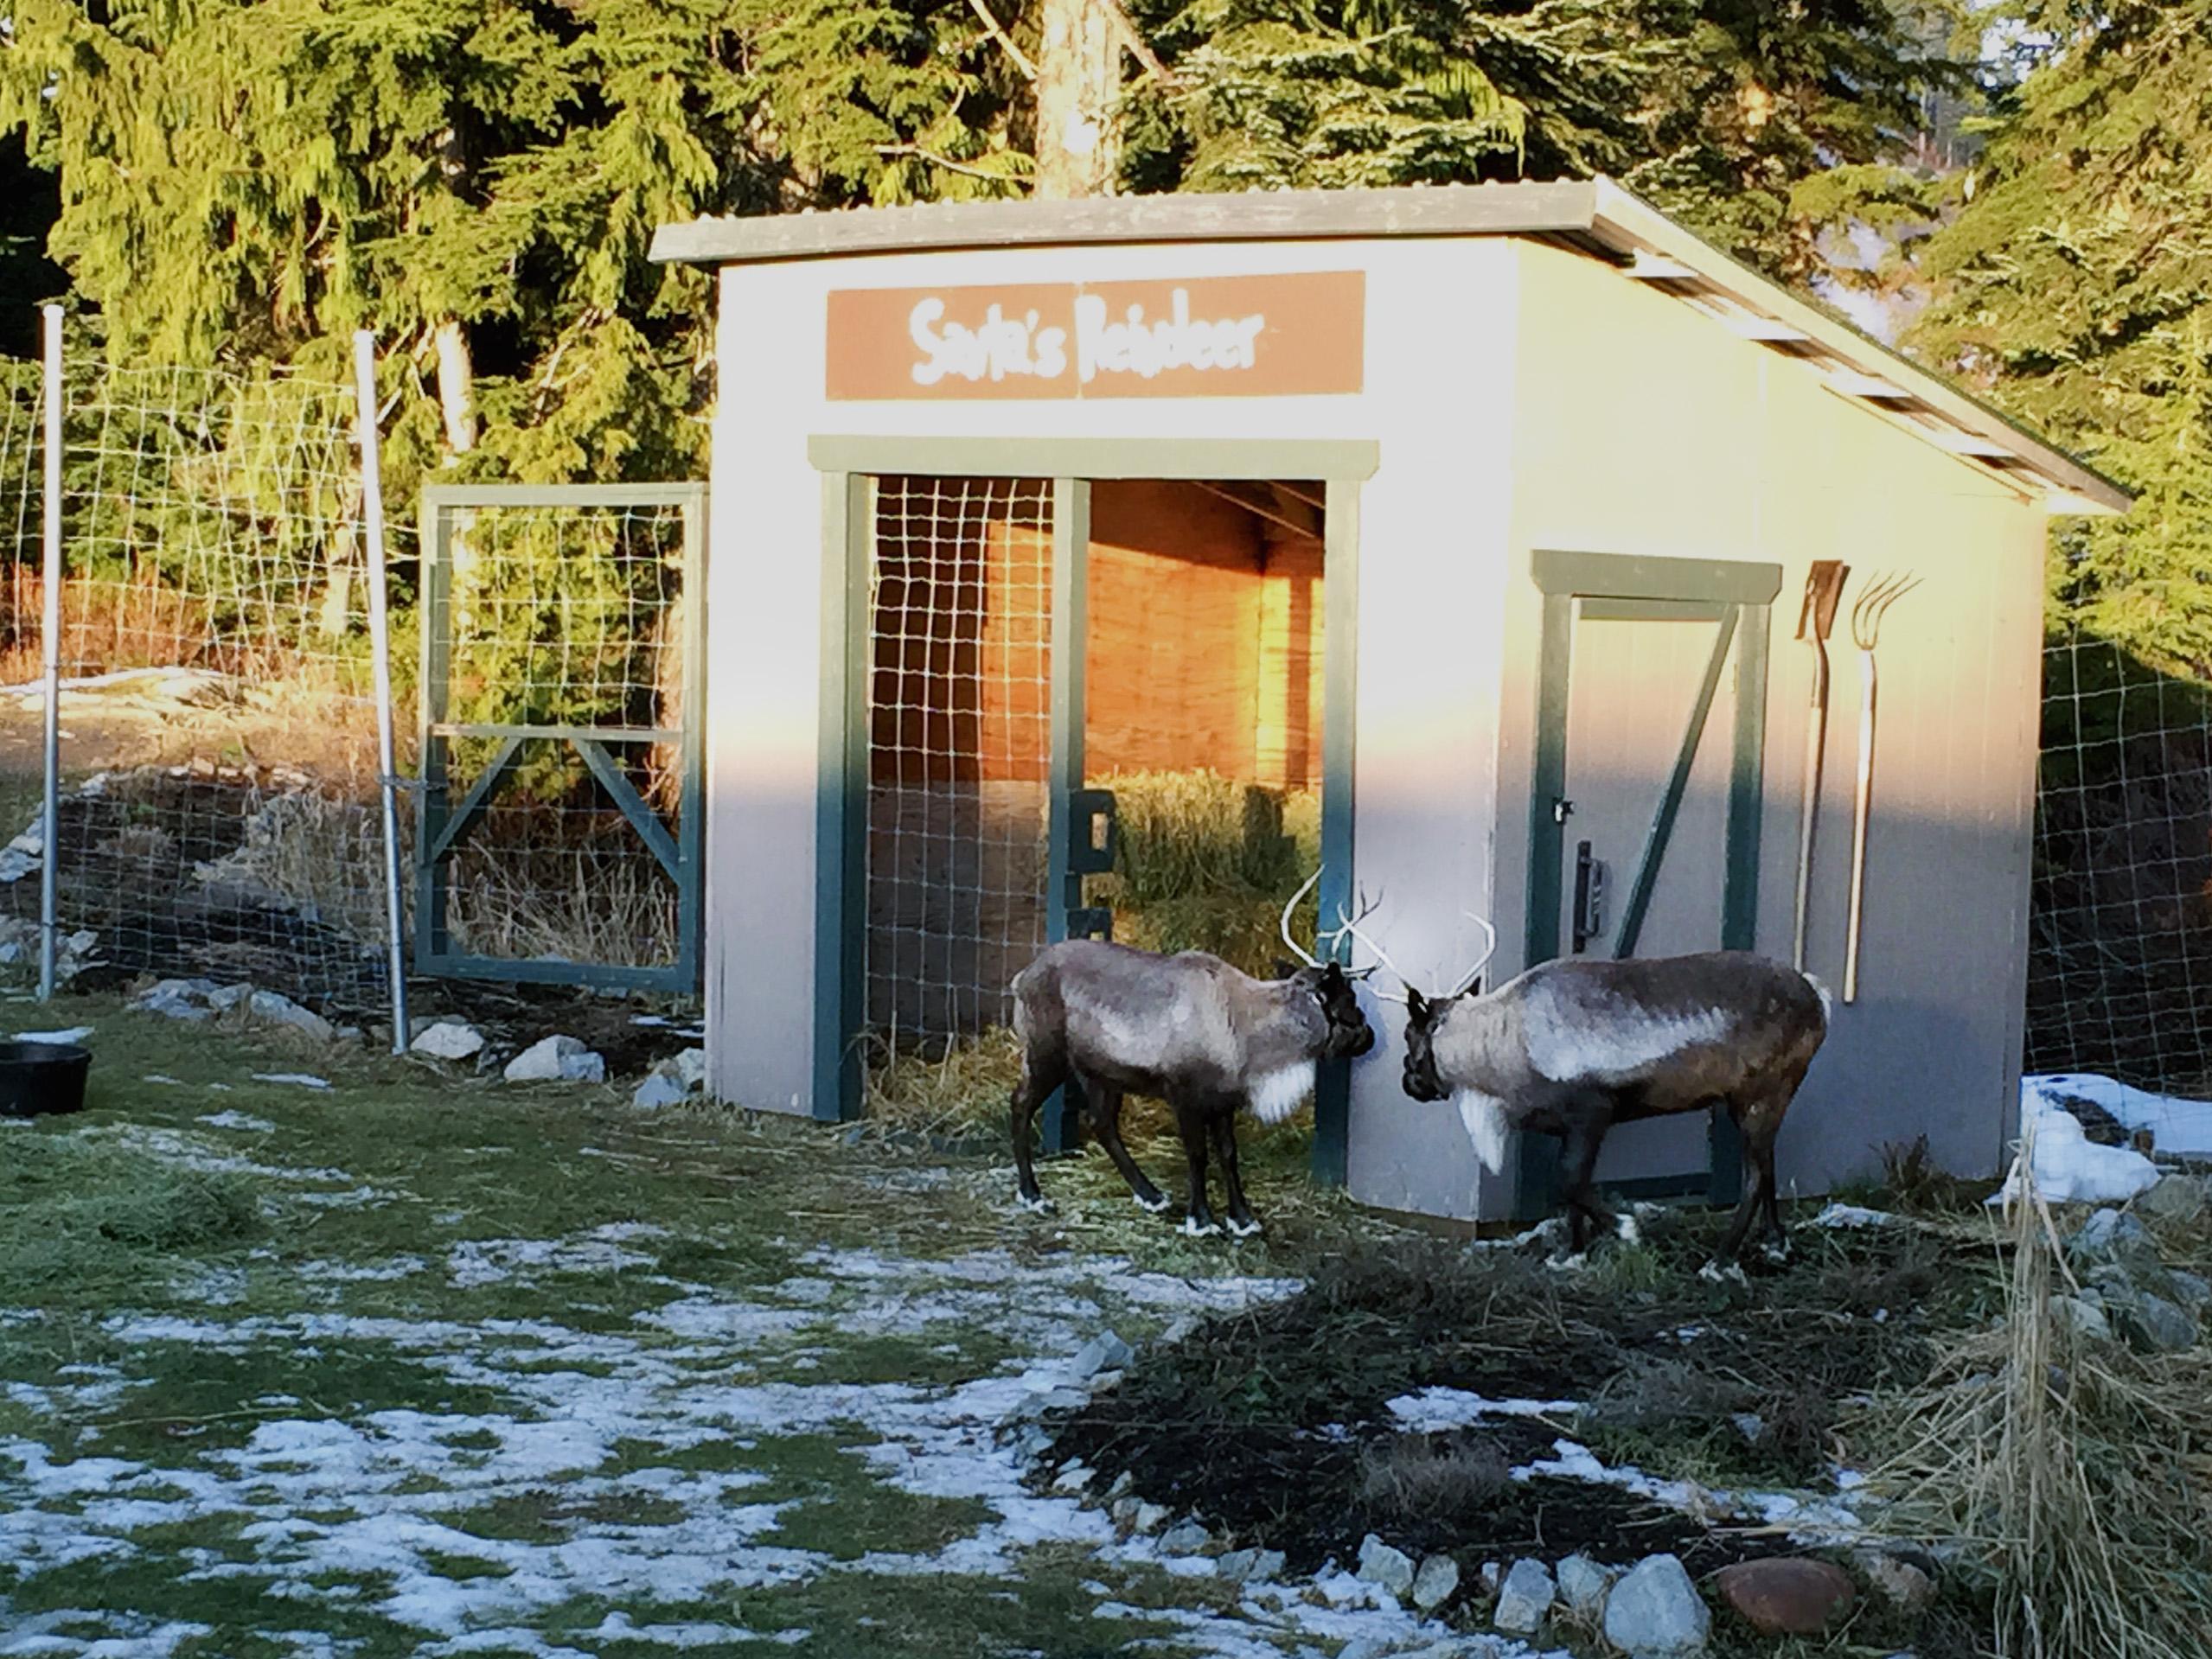 Shady reindeer